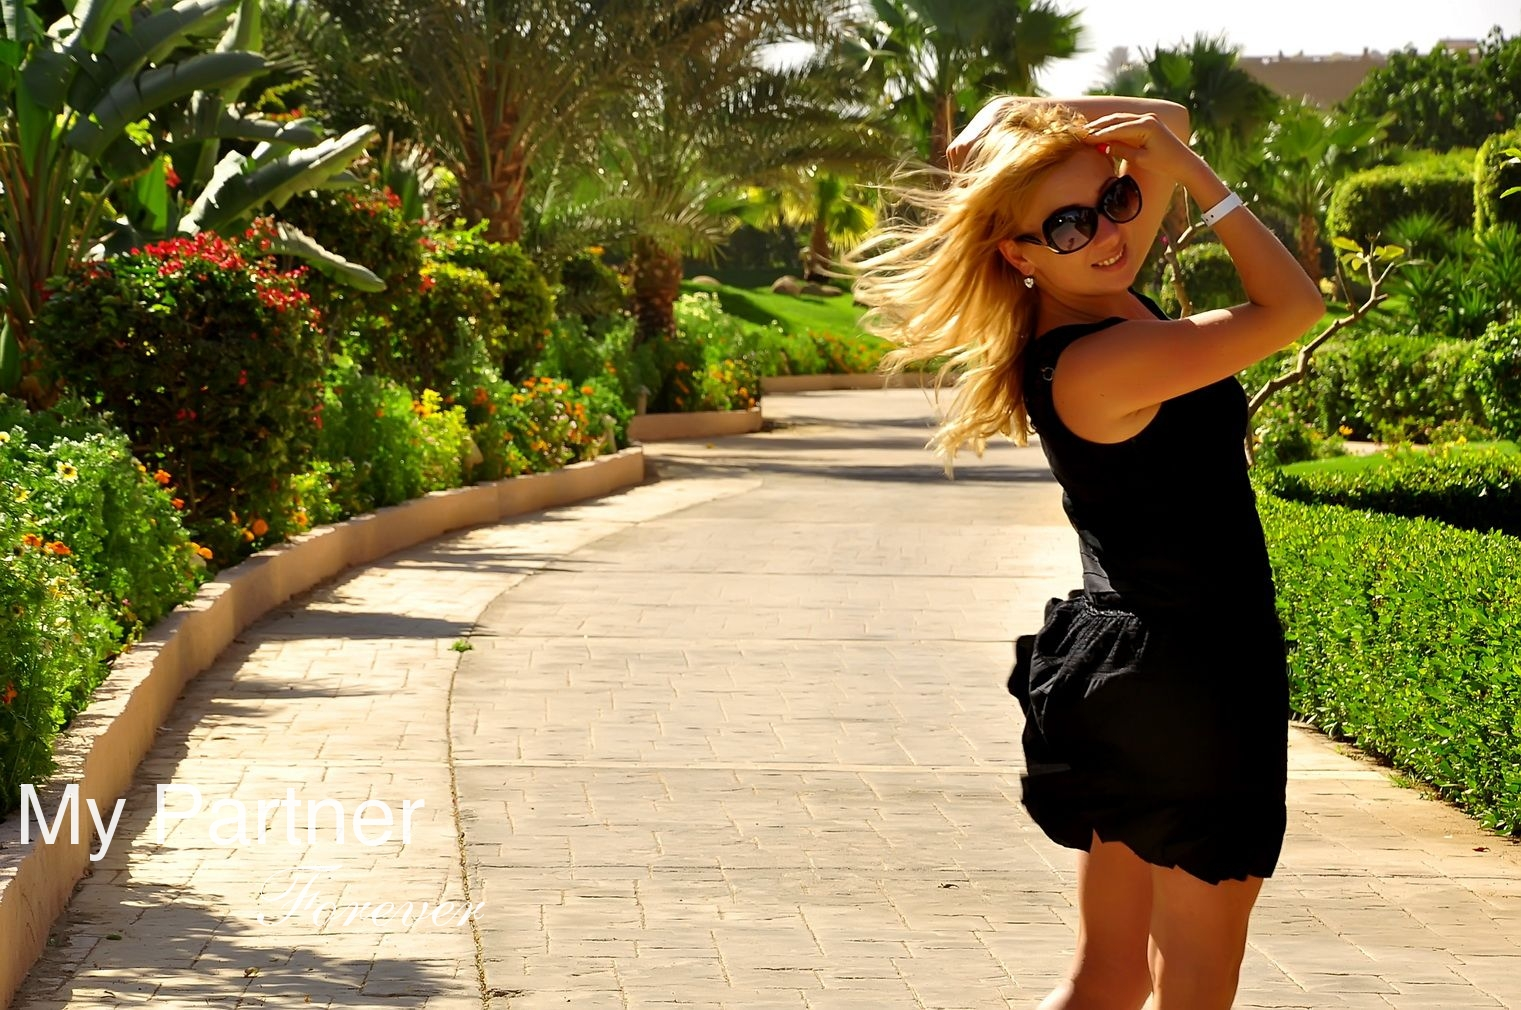 Dating Site to Meet Pretty Ukrainian Girl Marina from Kharkov, Ukraine